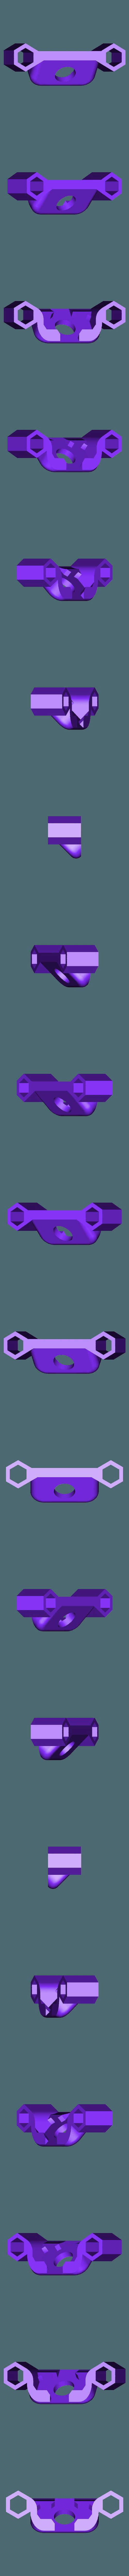 Alien_pigtail_45.stl Download free STL file ALIEN 5 IMPULSE RC SUPPORT PIGTAIL (ALL TYPES) • 3D printable design, Rhizamax